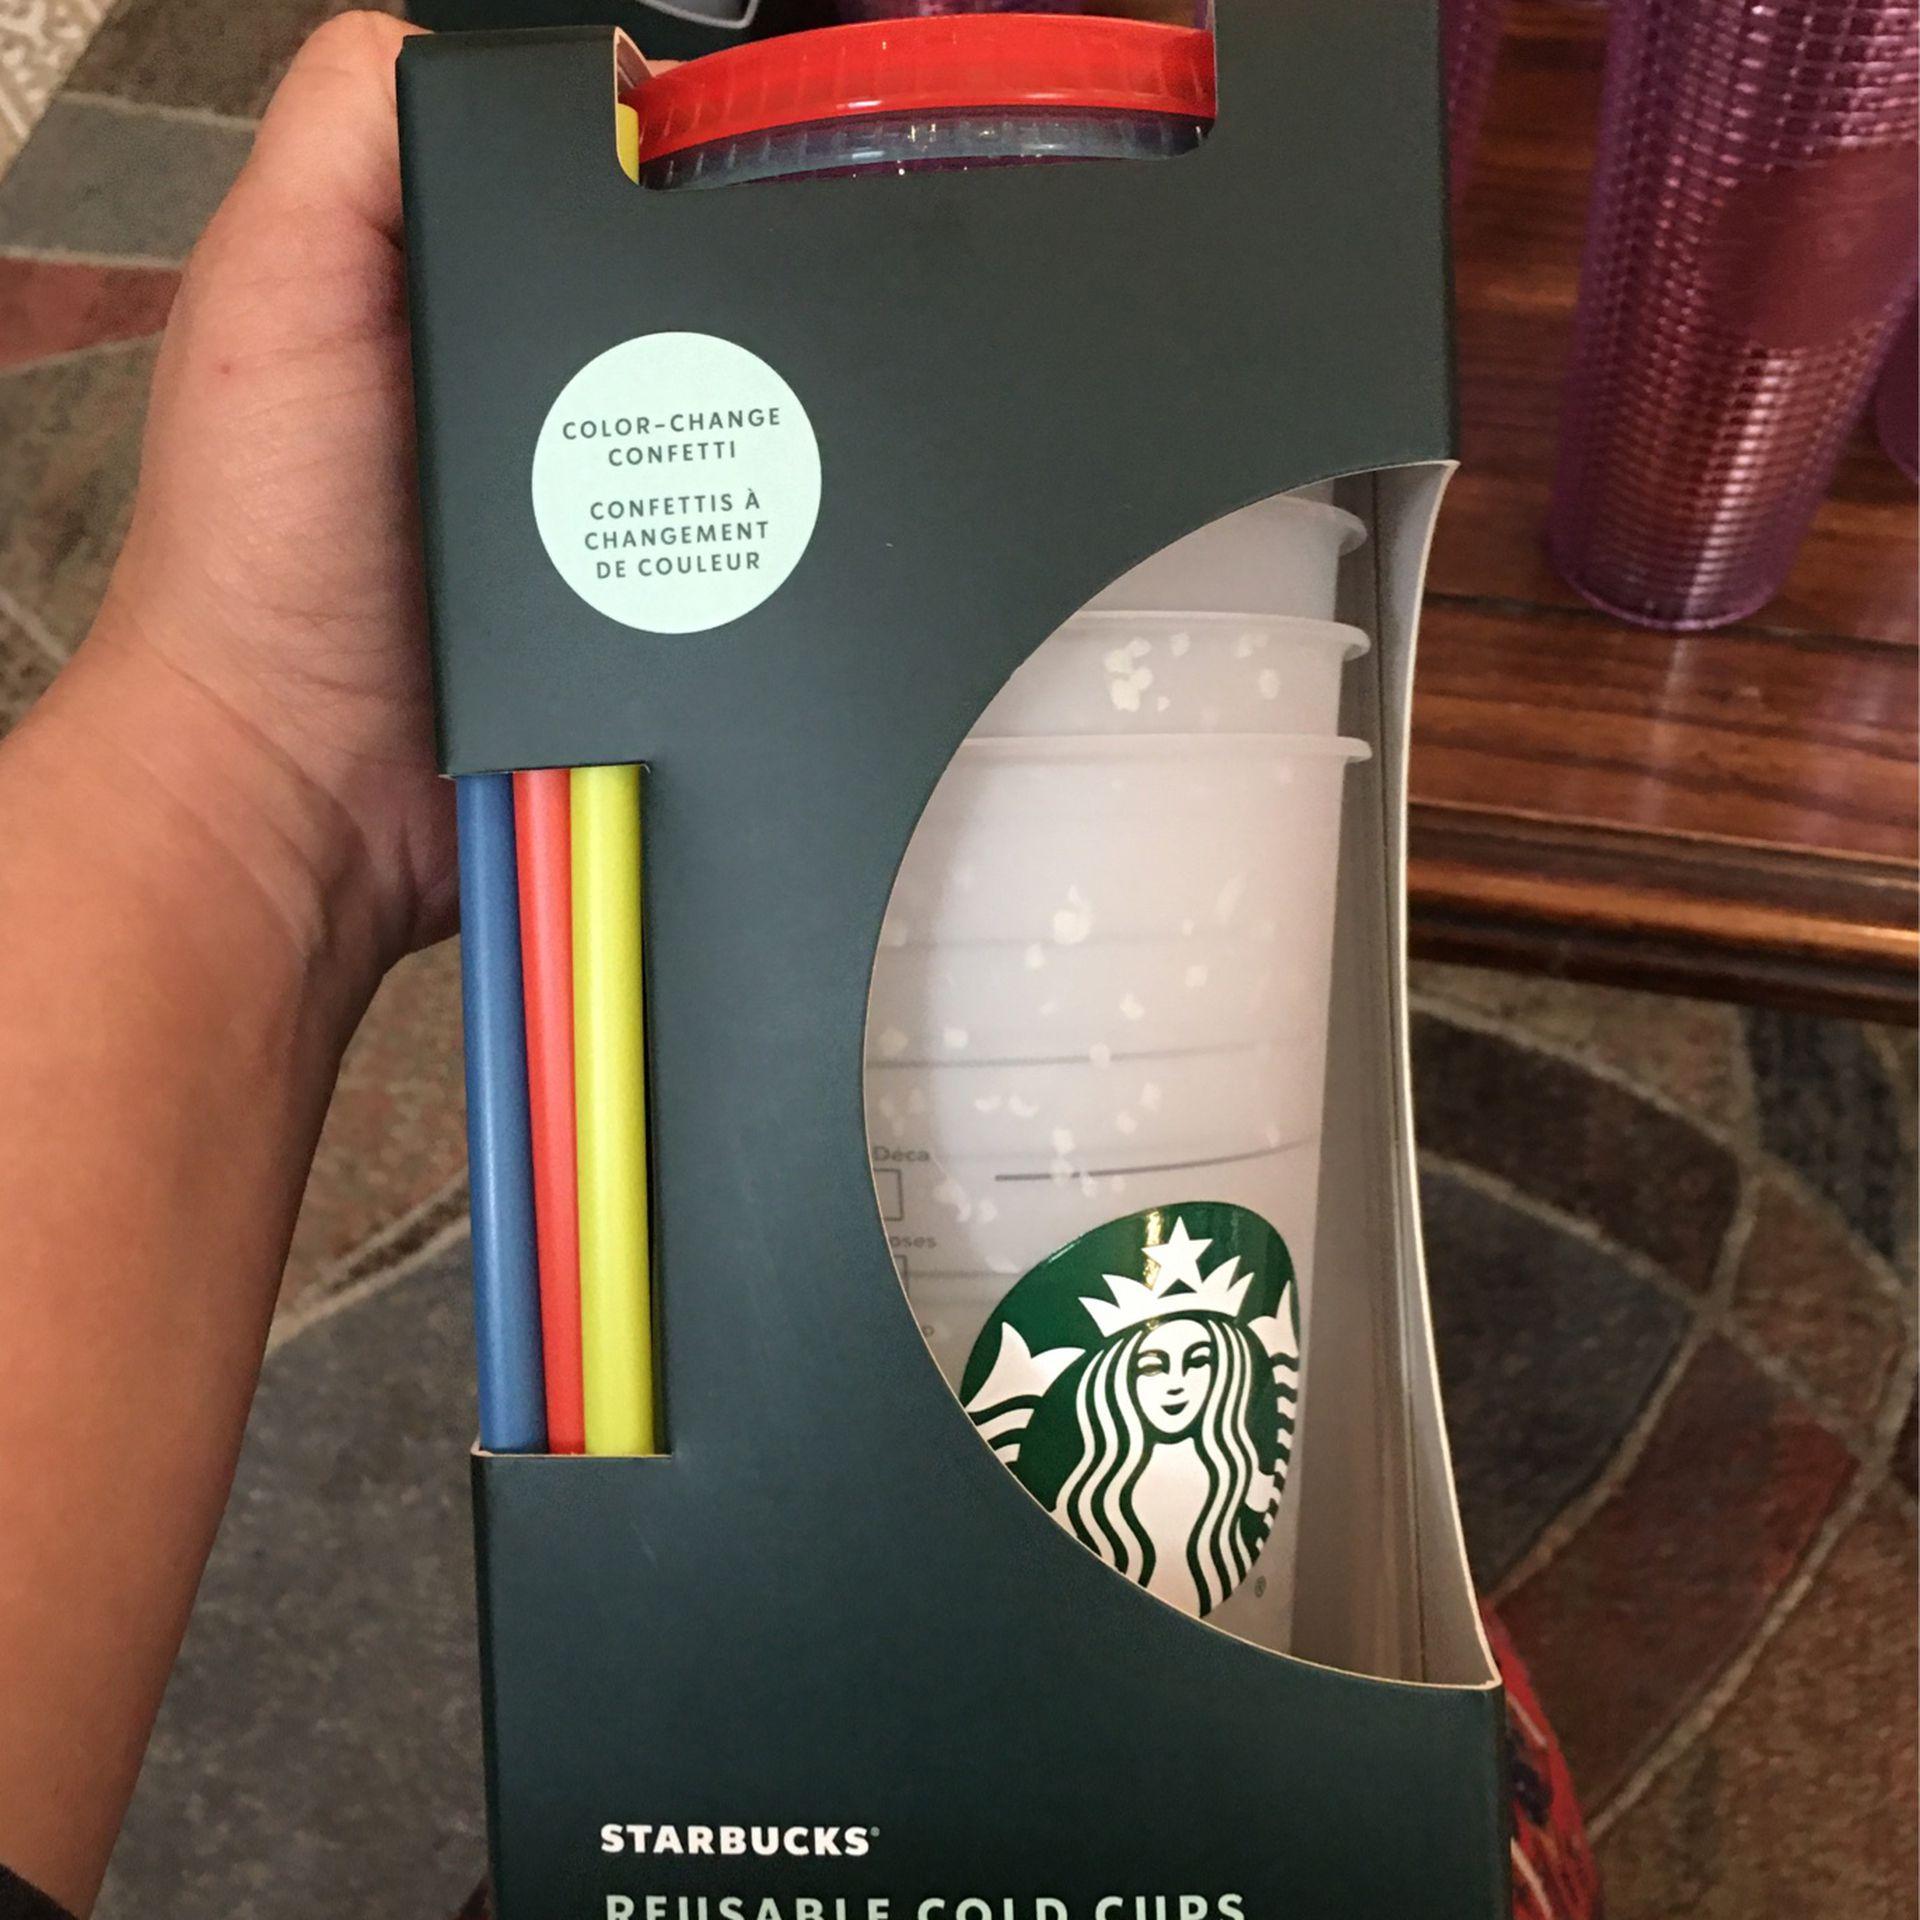 Starbucks Reusable Cold Cups